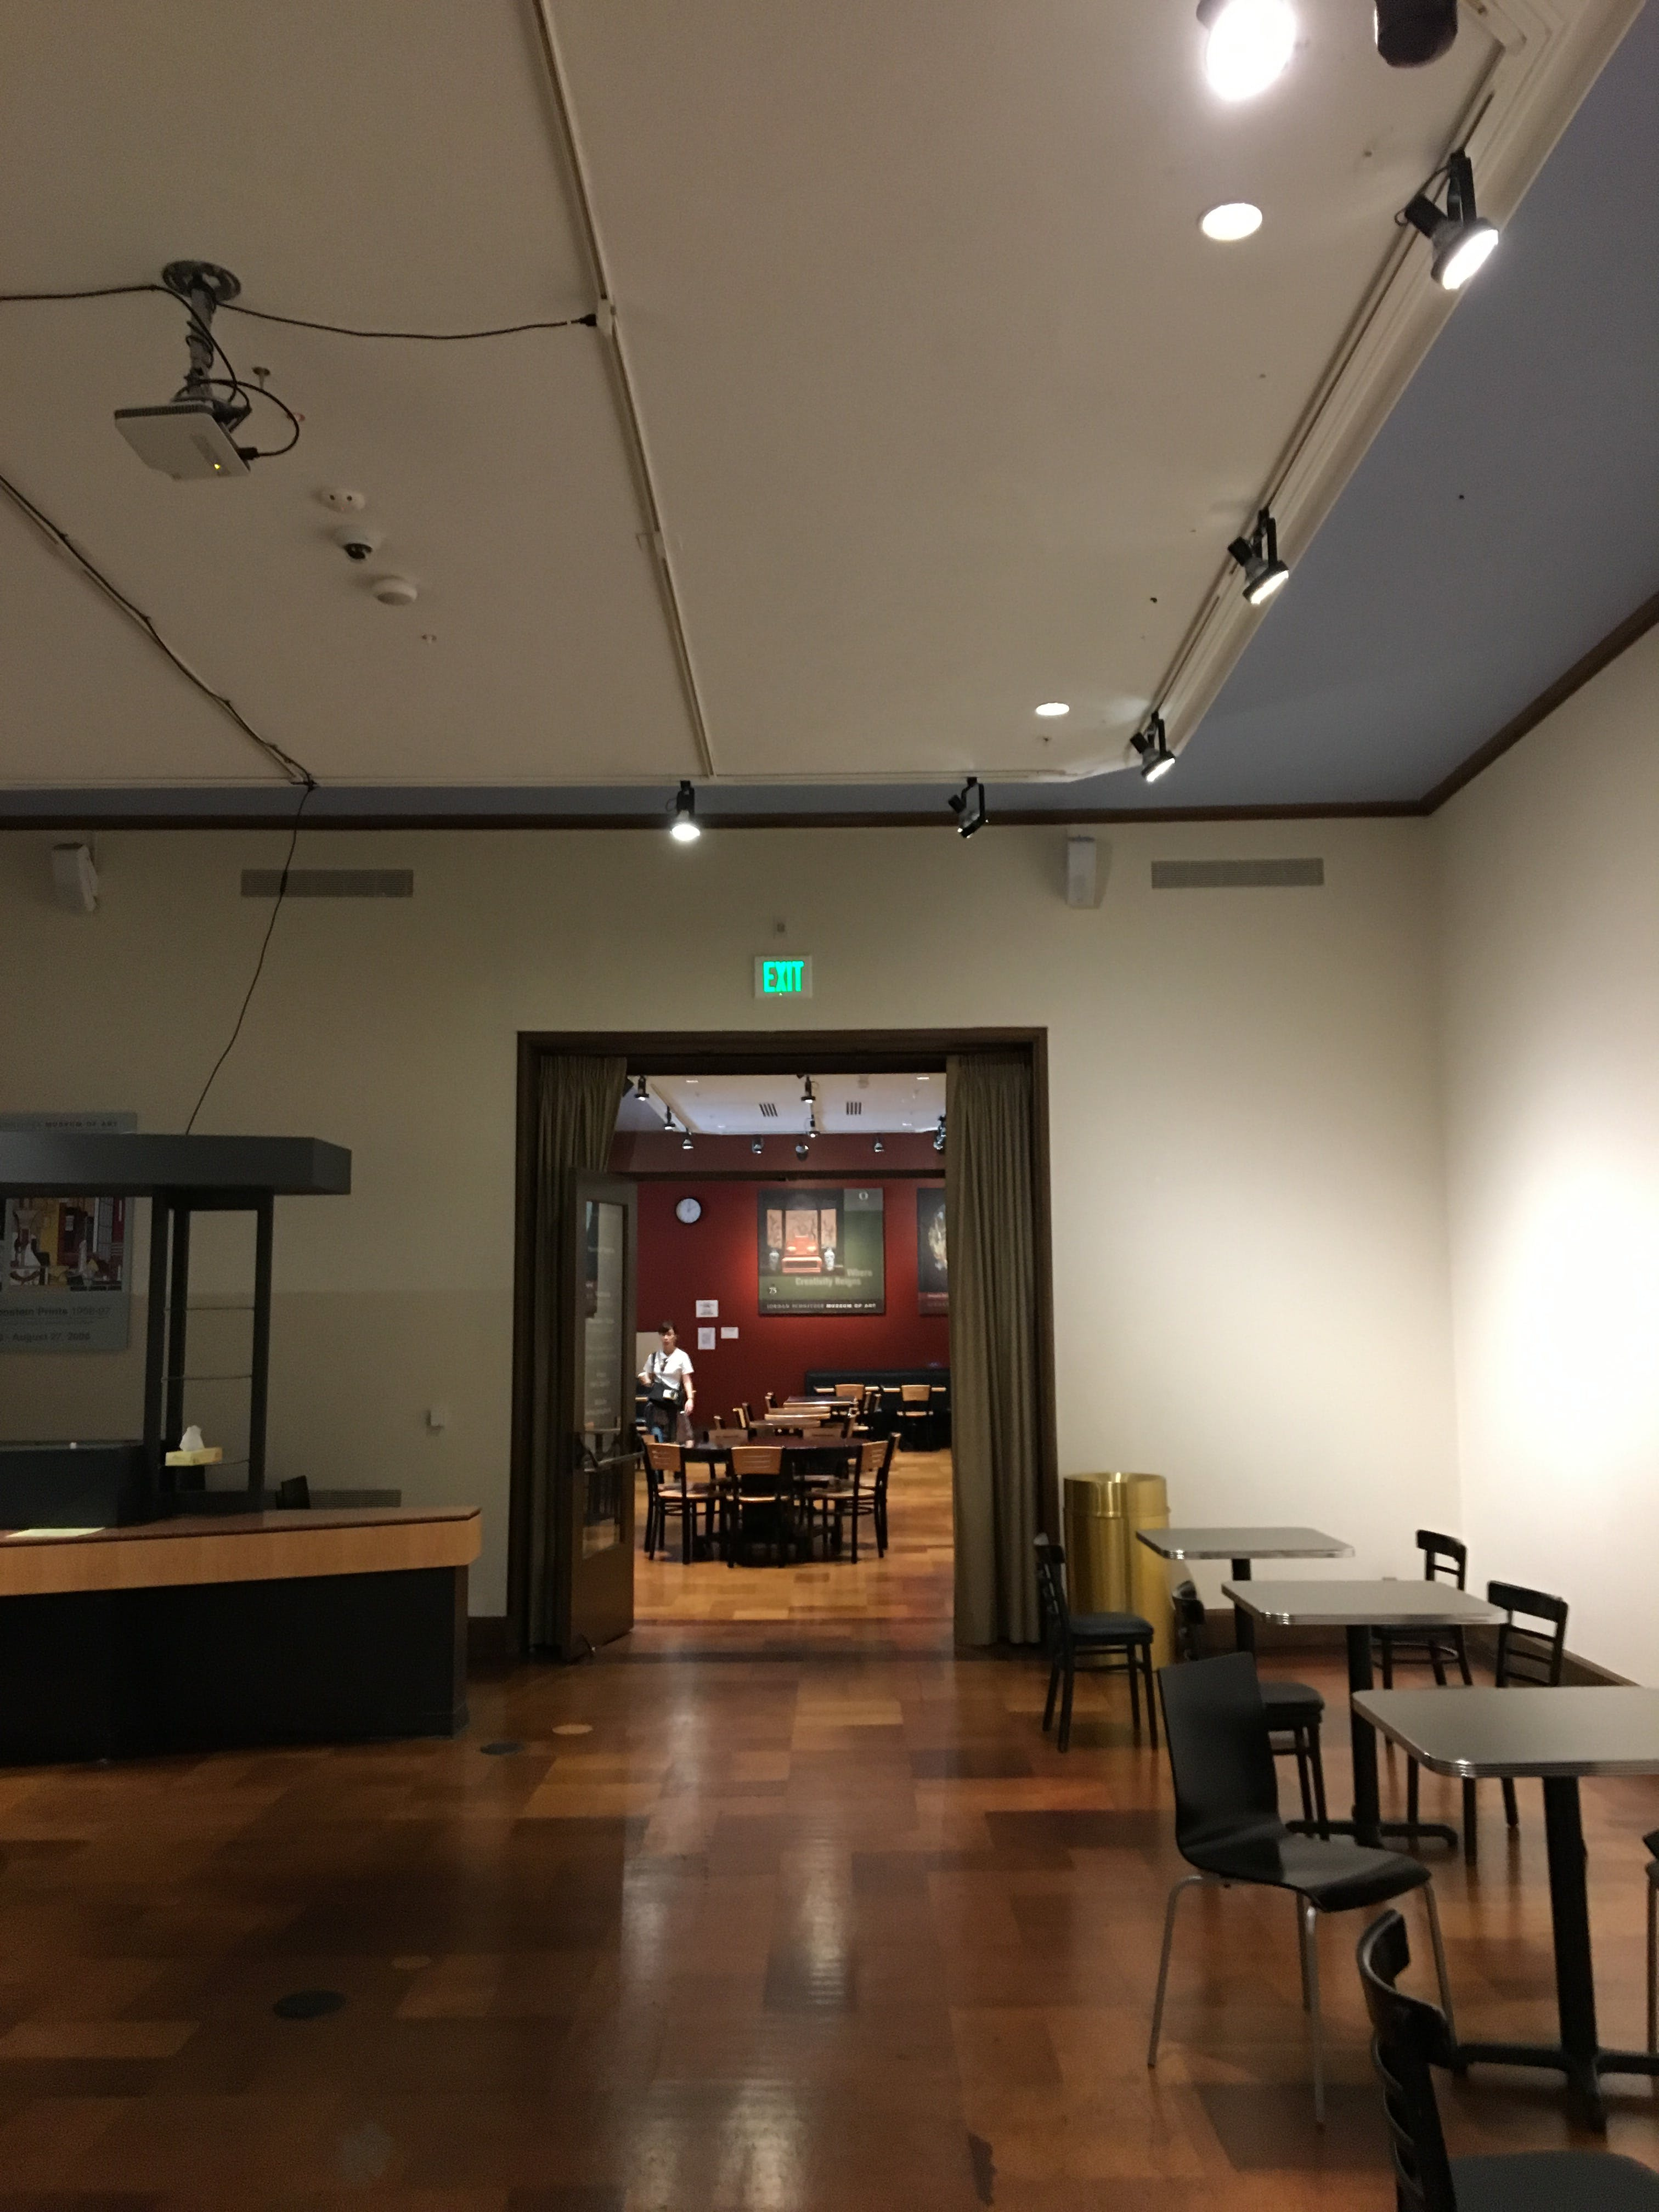 Jordan Schnitzer Museum Of Art Daniel Purtha Archinect - Jordan schnitzer museum